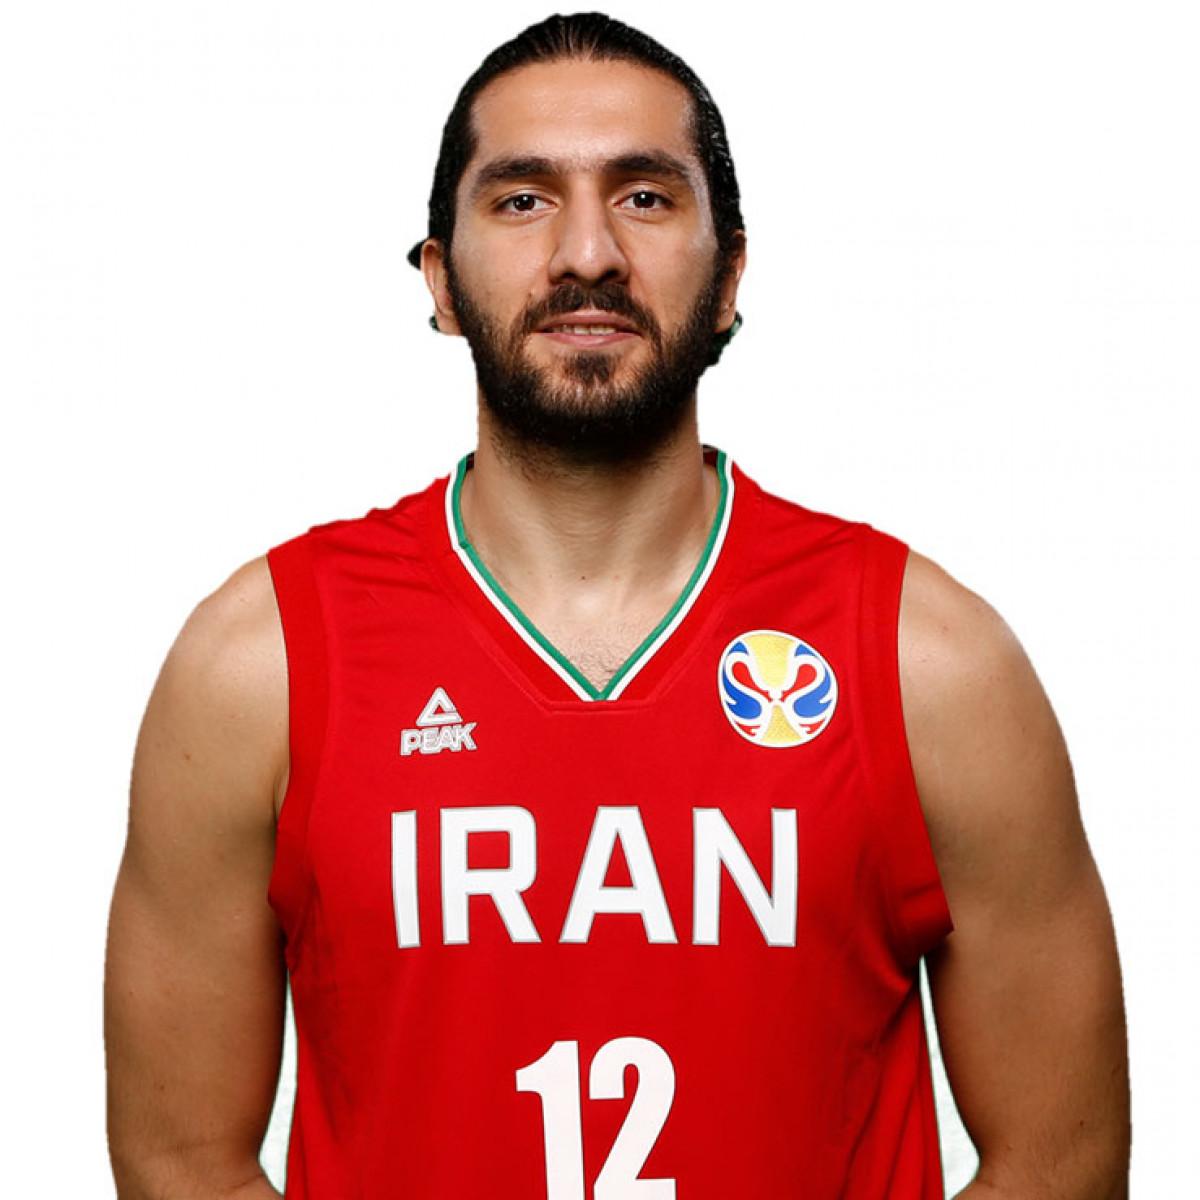 Photo of Arman Zangeneh, 2019-2020 season